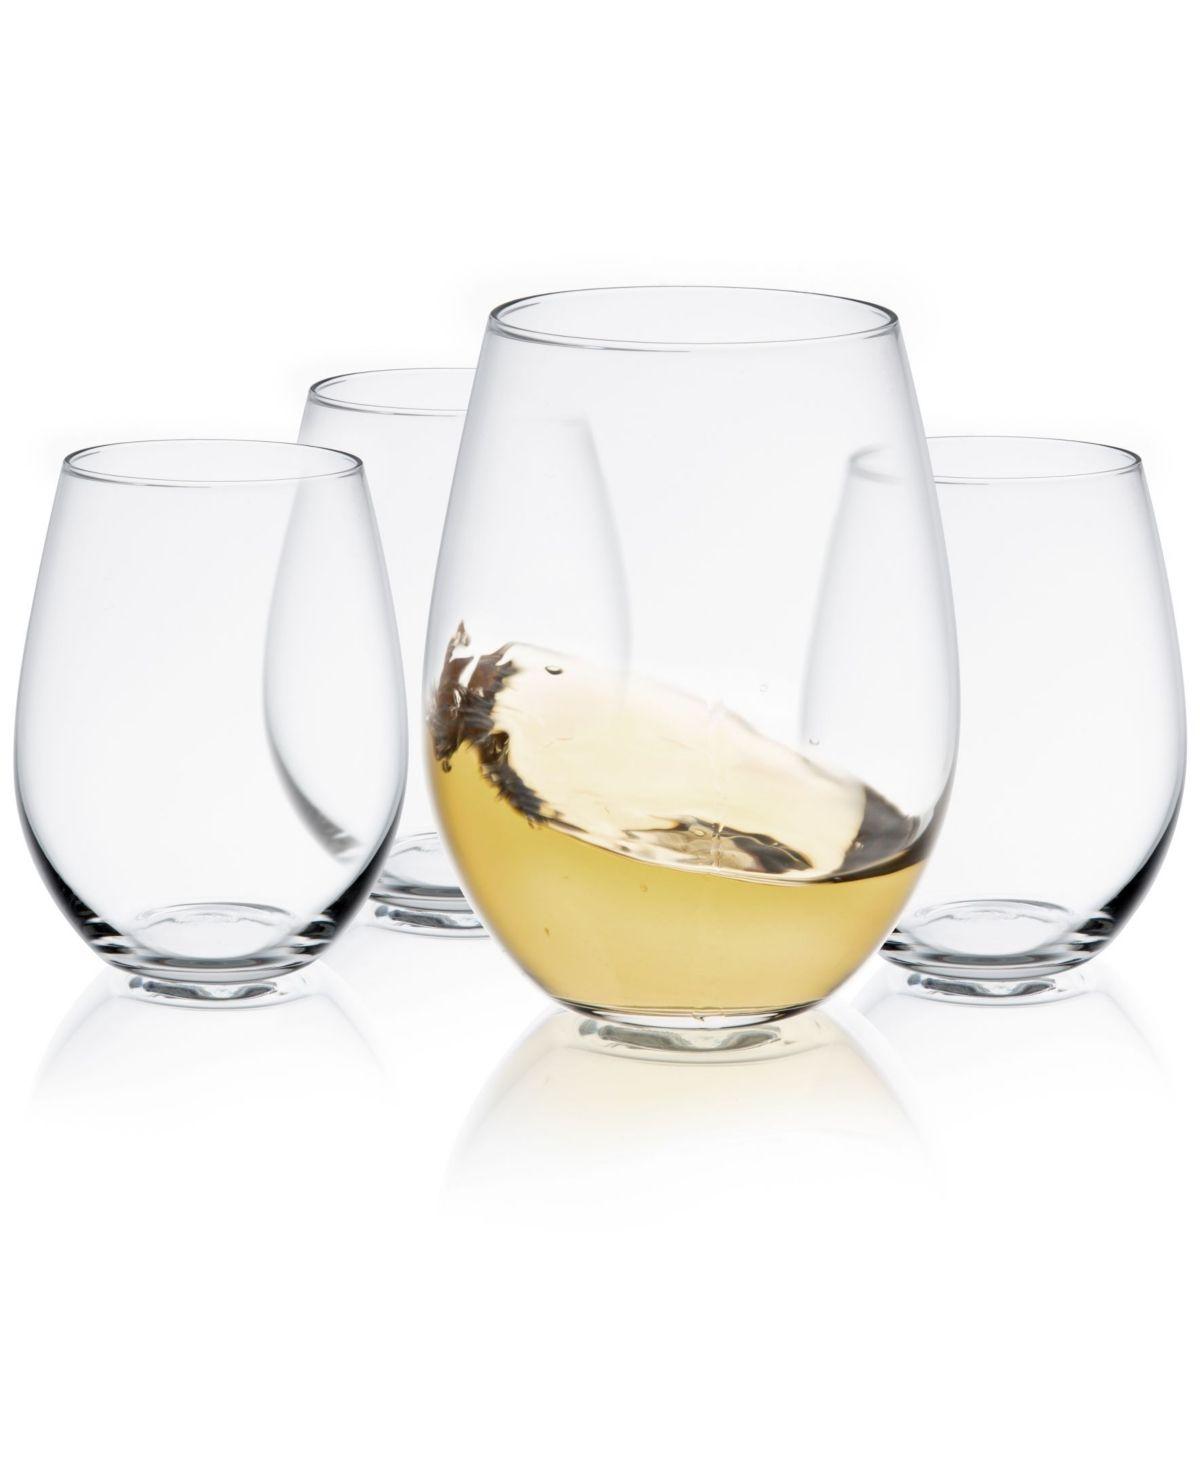 Joyjolt Spirits Stemless Wine Glass Set Of 4 Reviews Glassware